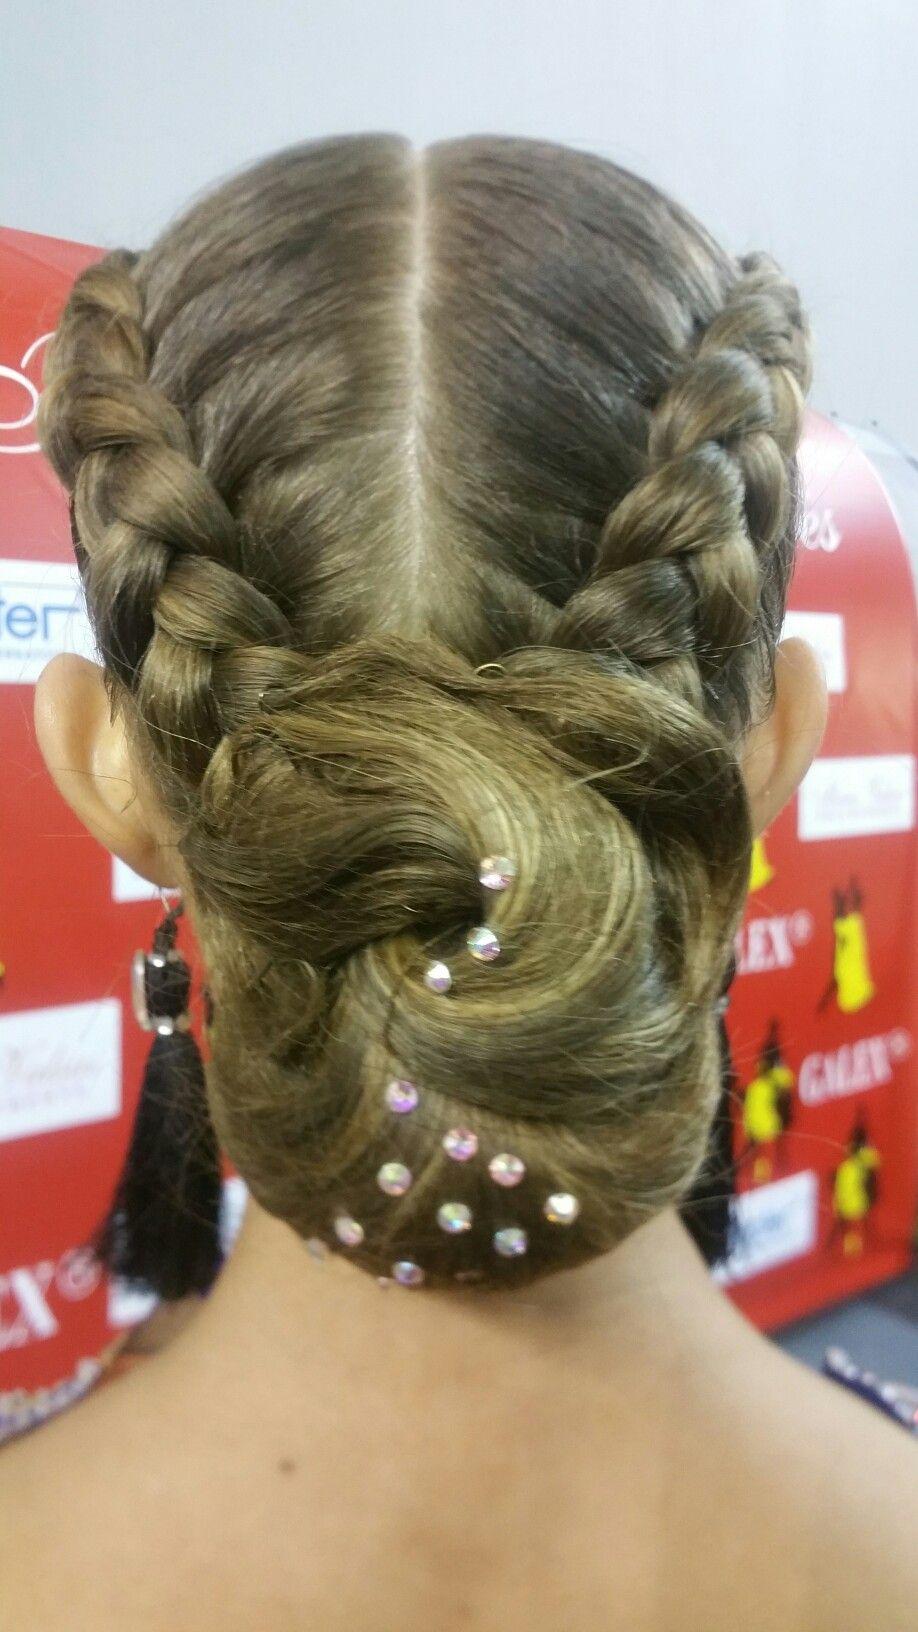 Pin By Violeta Petkevicienė On Ballroom Dance Hair Party Hairstyles Dance Hairstyles Easy Party Hairstyles